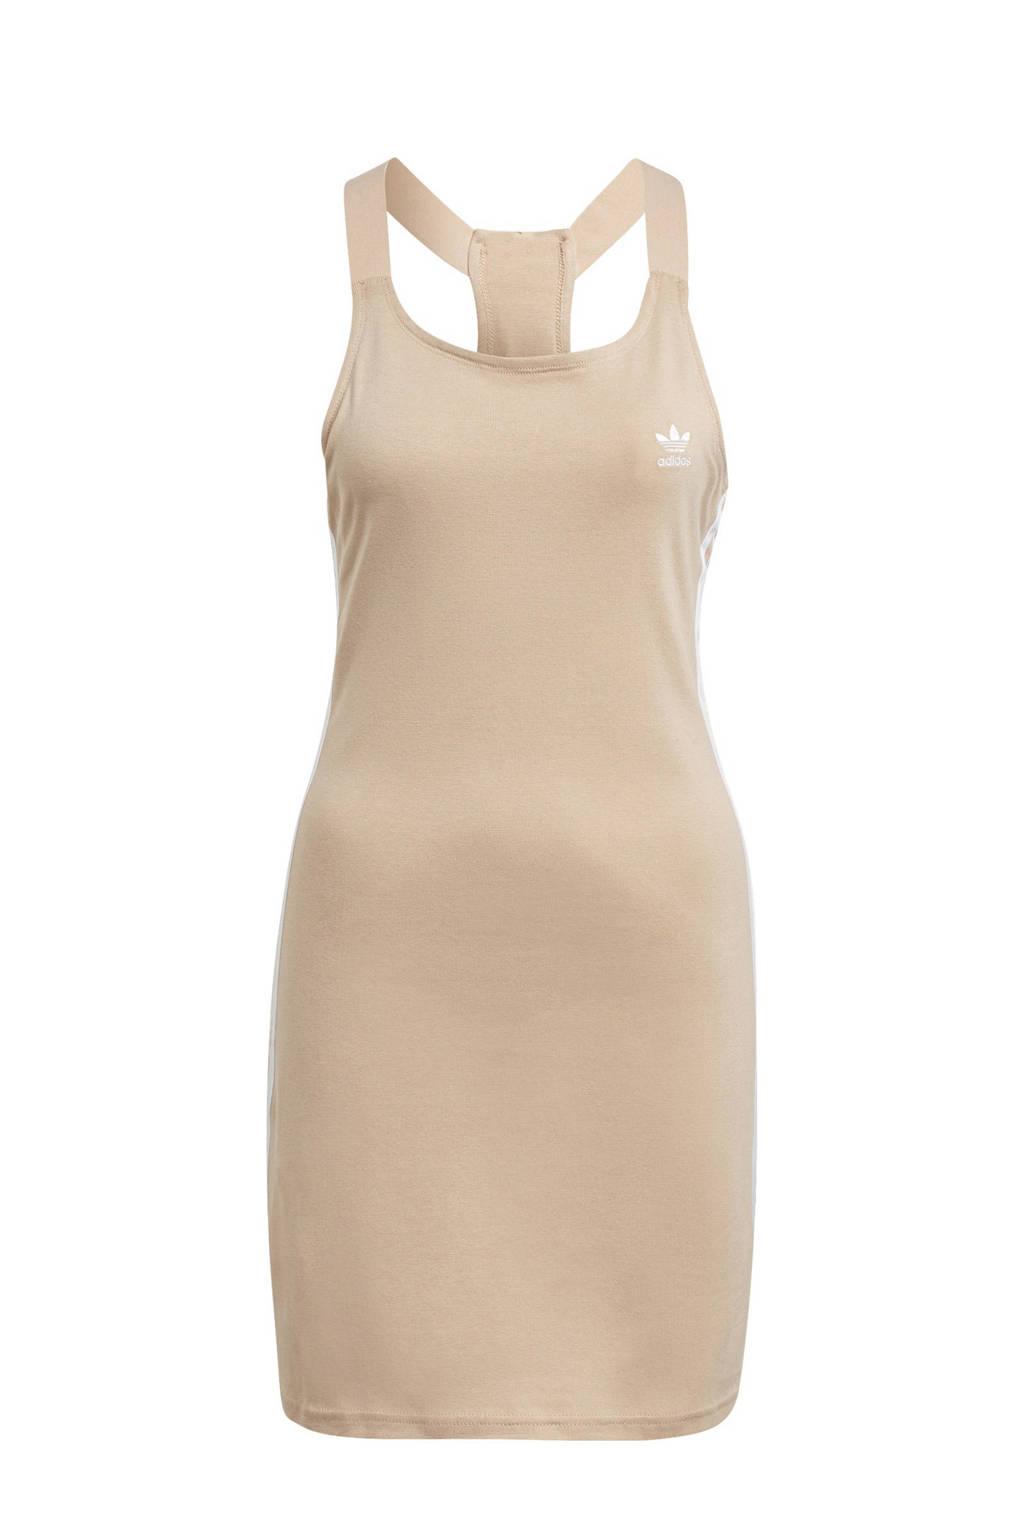 adidas Originals Adicolor jurk beige/wit, Beige/wit